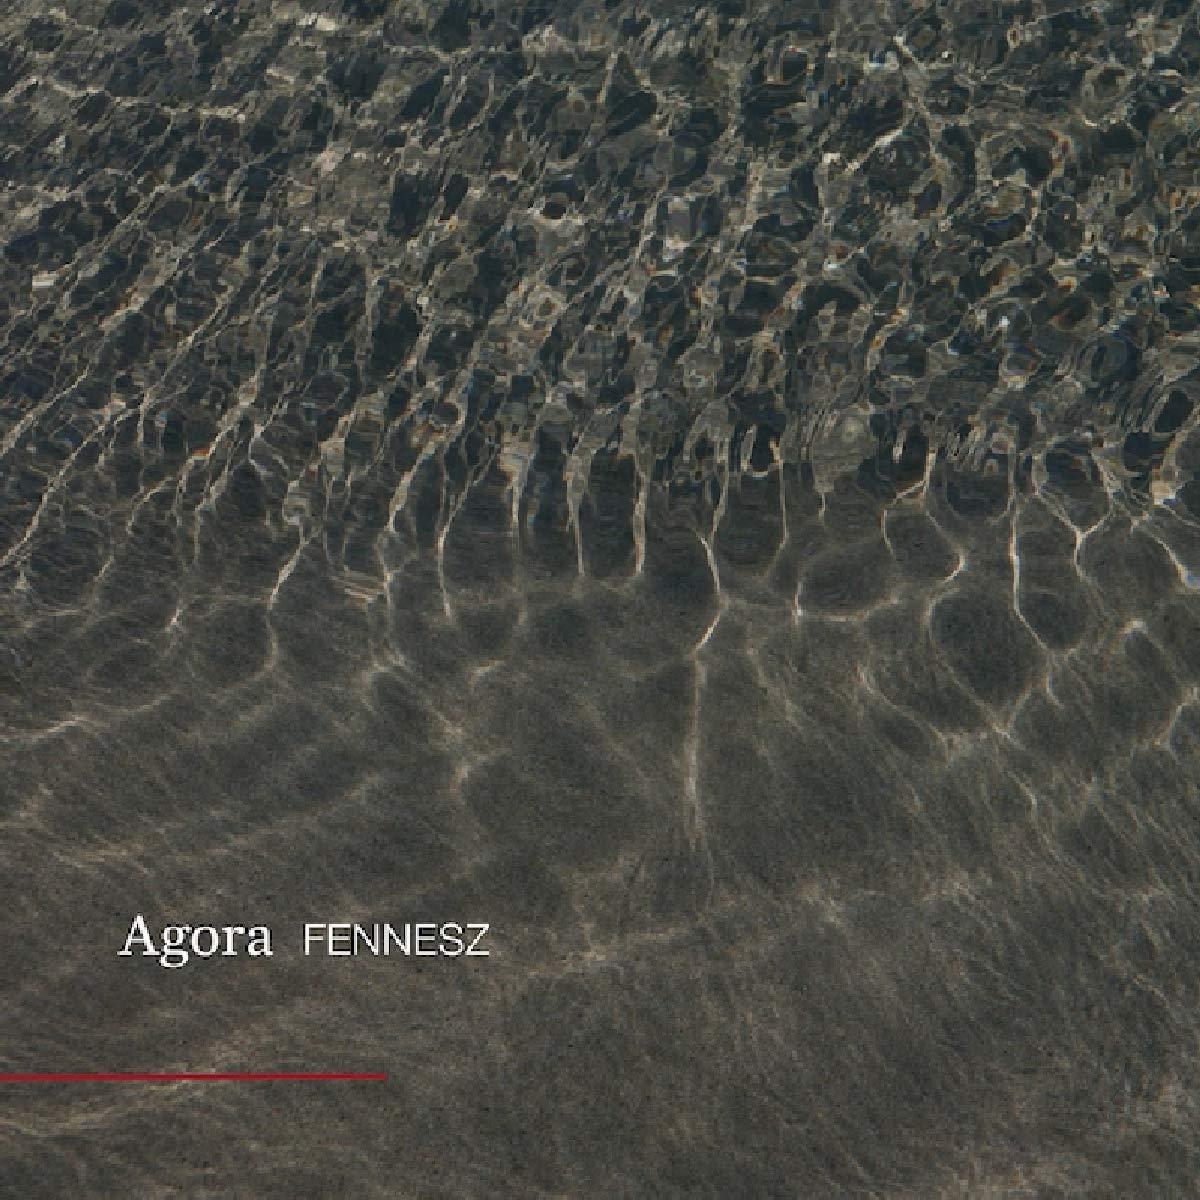 「fennesz agora」の画像検索結果